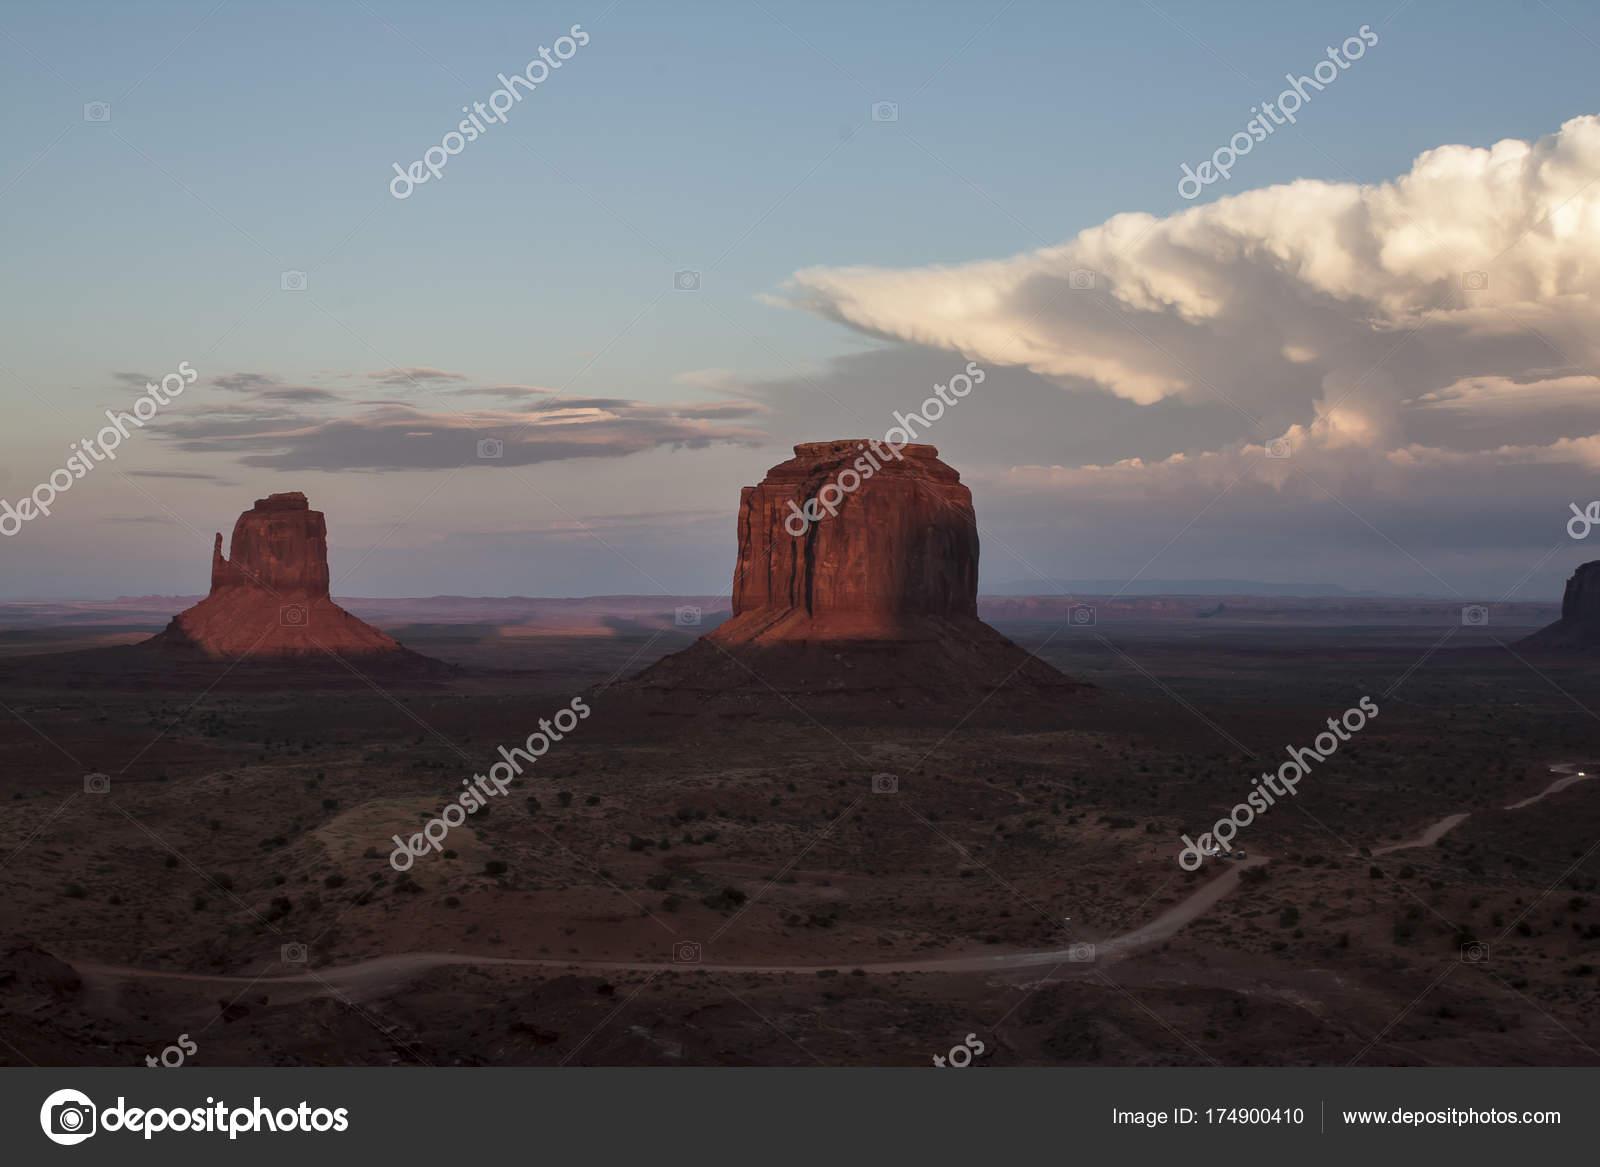 Monument Valley Parc Tribal Photographie Pluto51 C 174900410